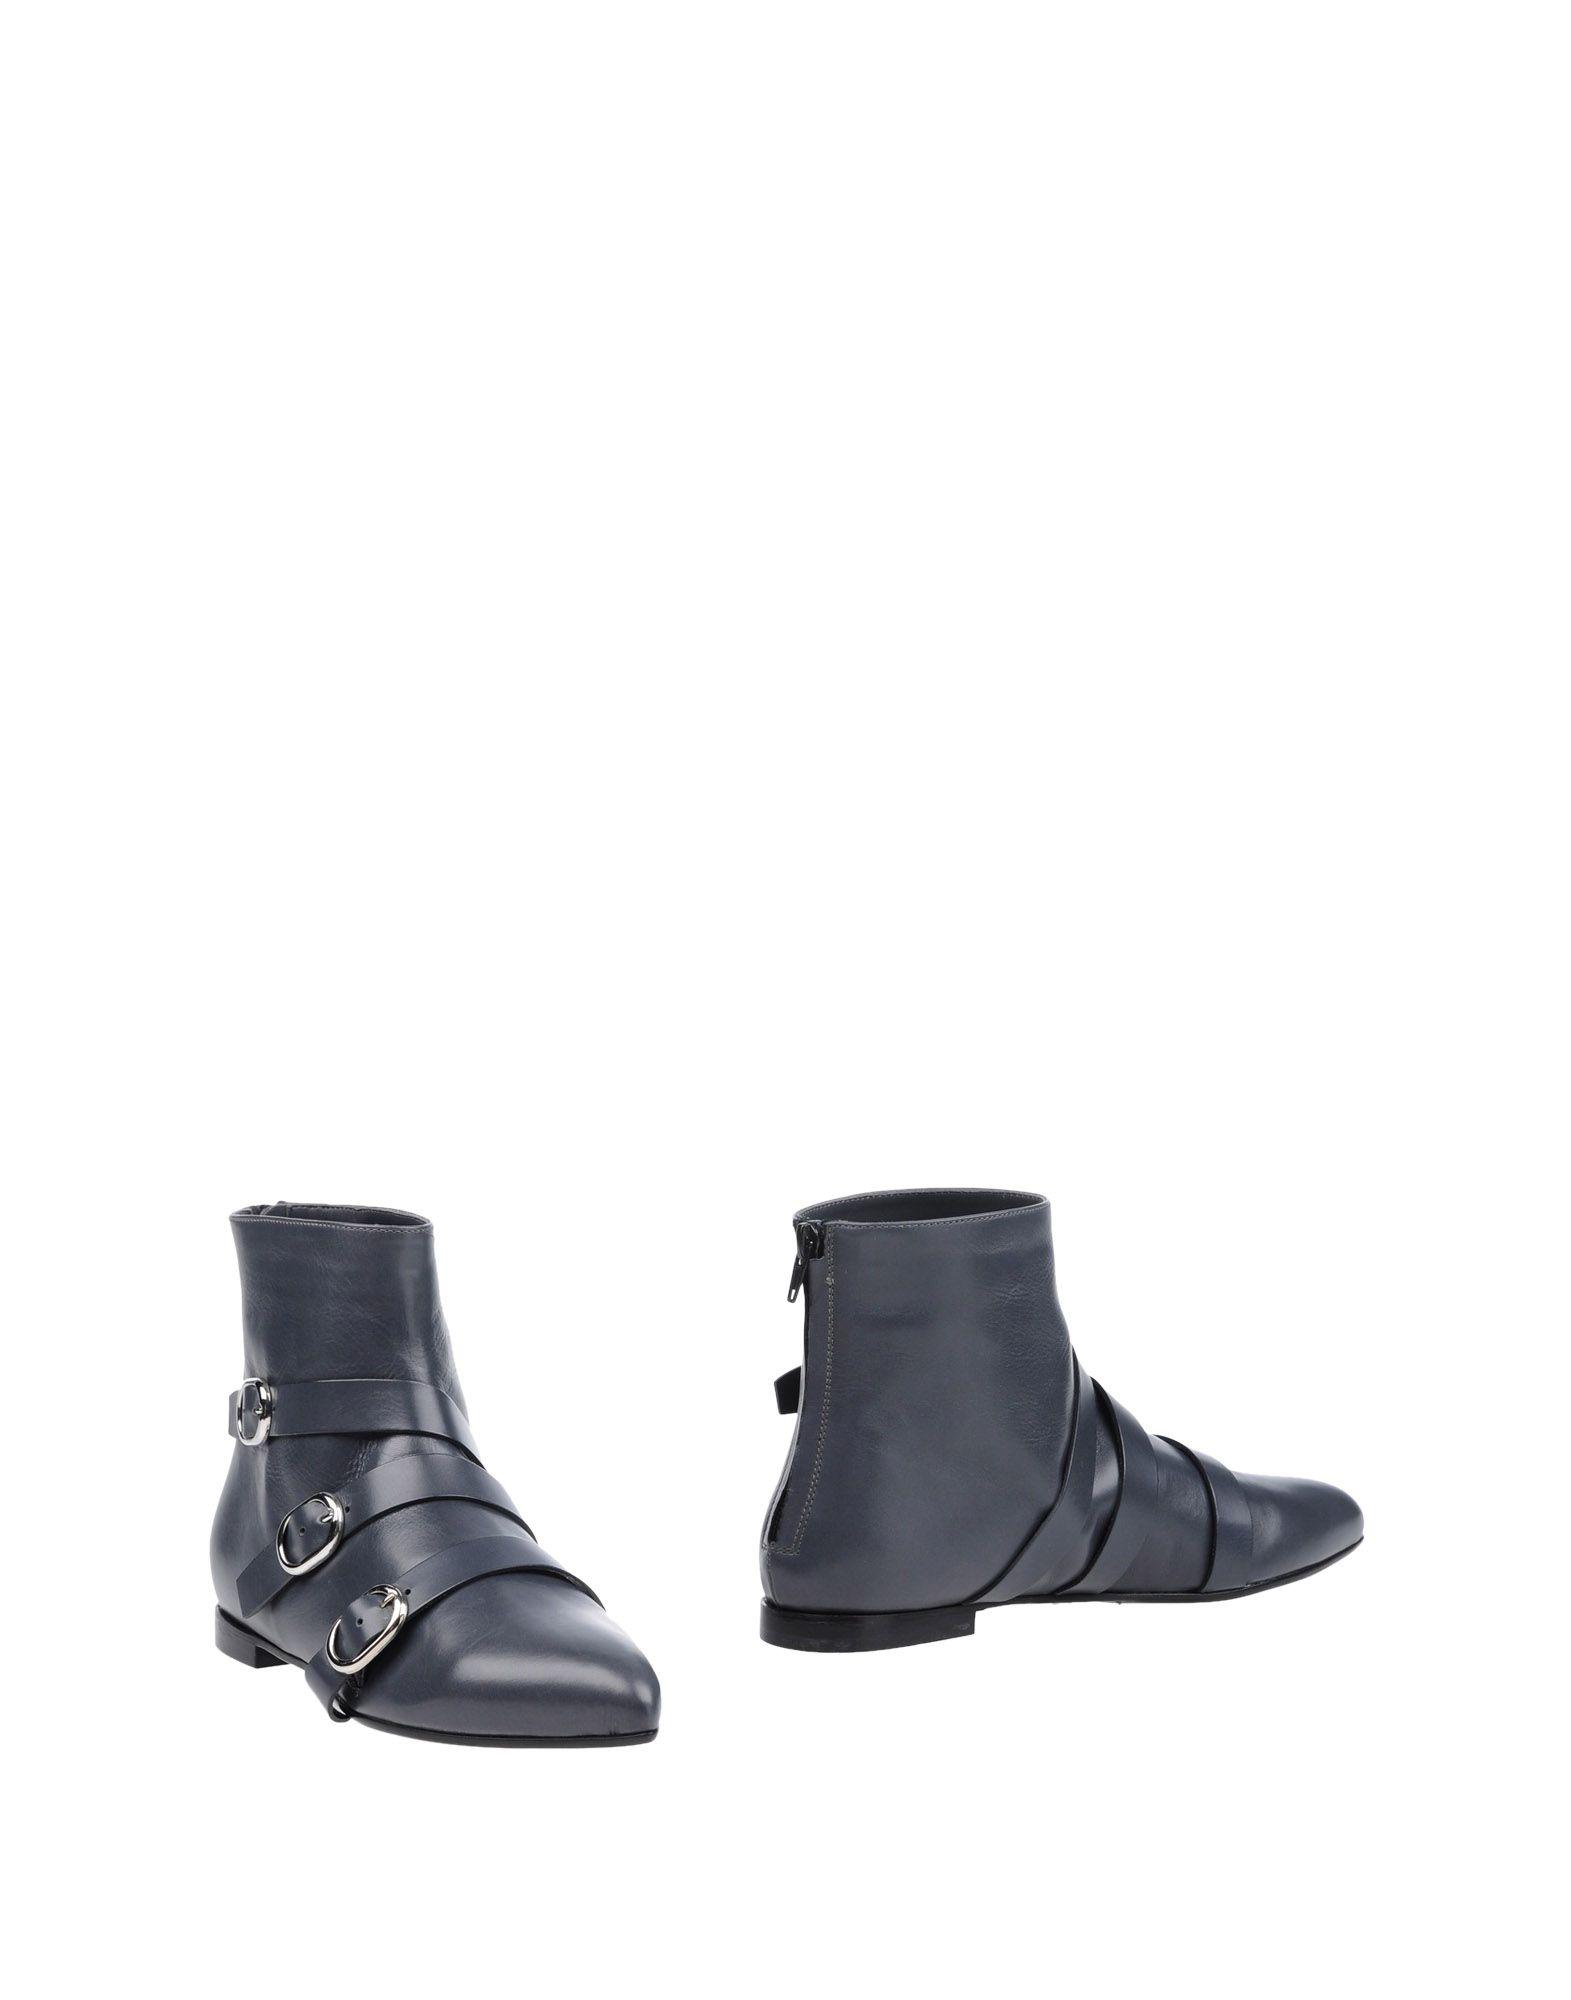 Kallistè Stiefelette beliebte Damen  11361323HX Gute Qualität beliebte Stiefelette Schuhe cc7e2e